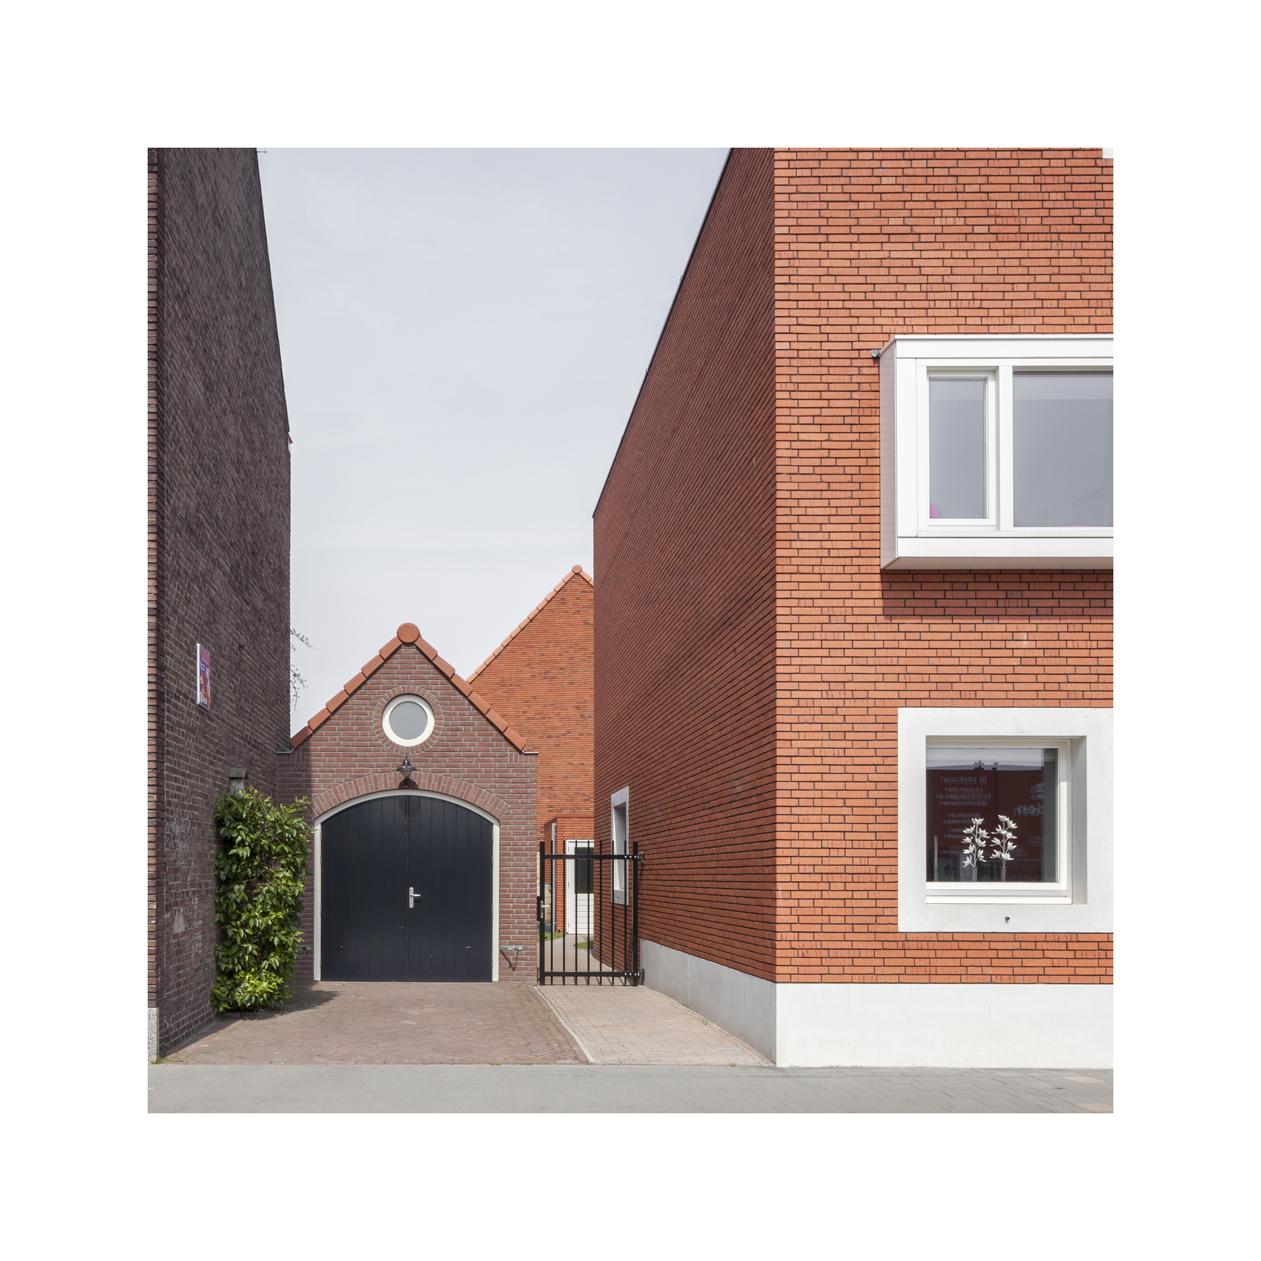 Groeseind (Tilburg, NL)